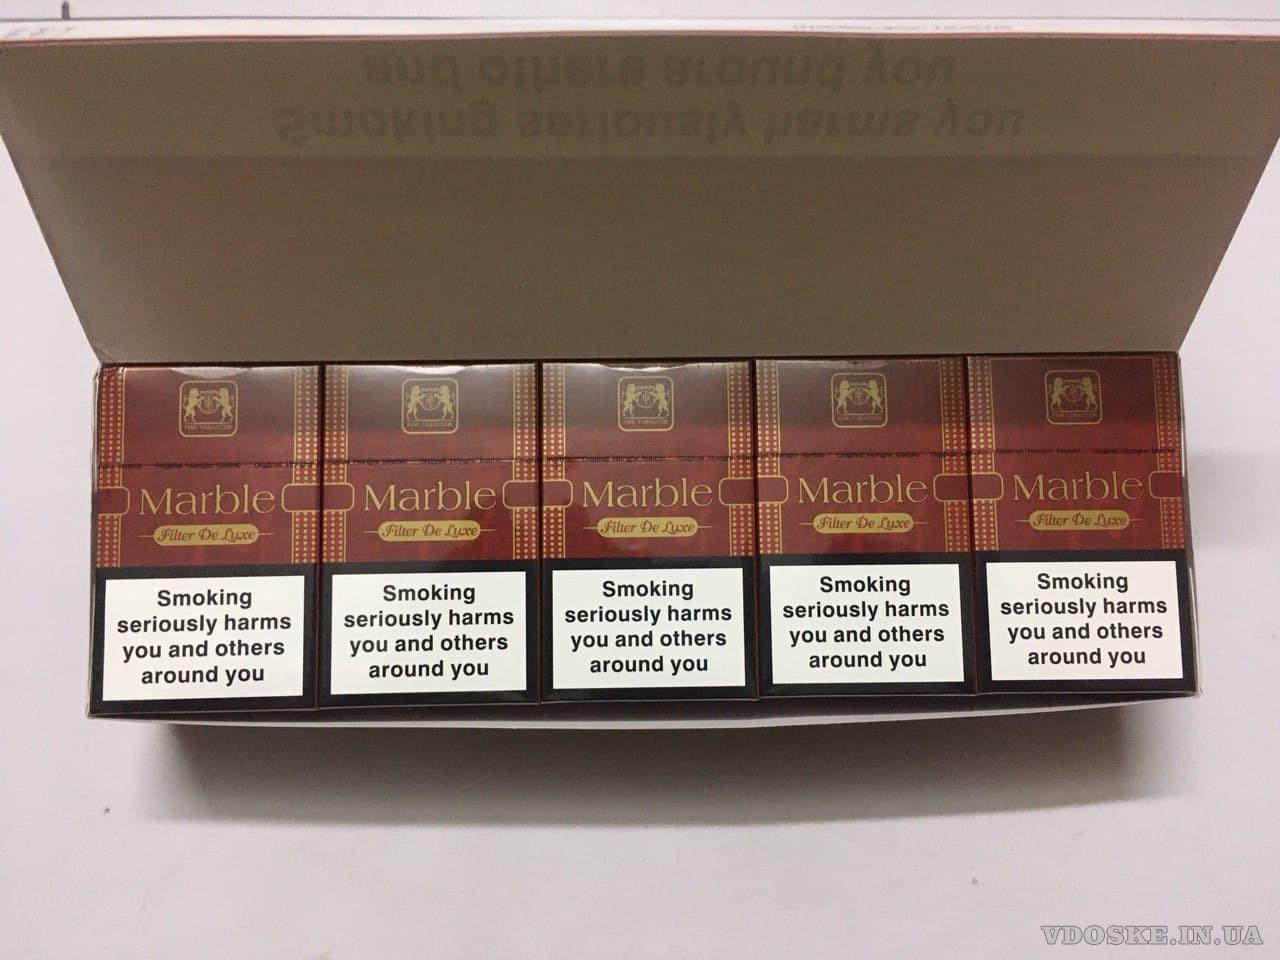 Cигареты Marble (картон)  оптом